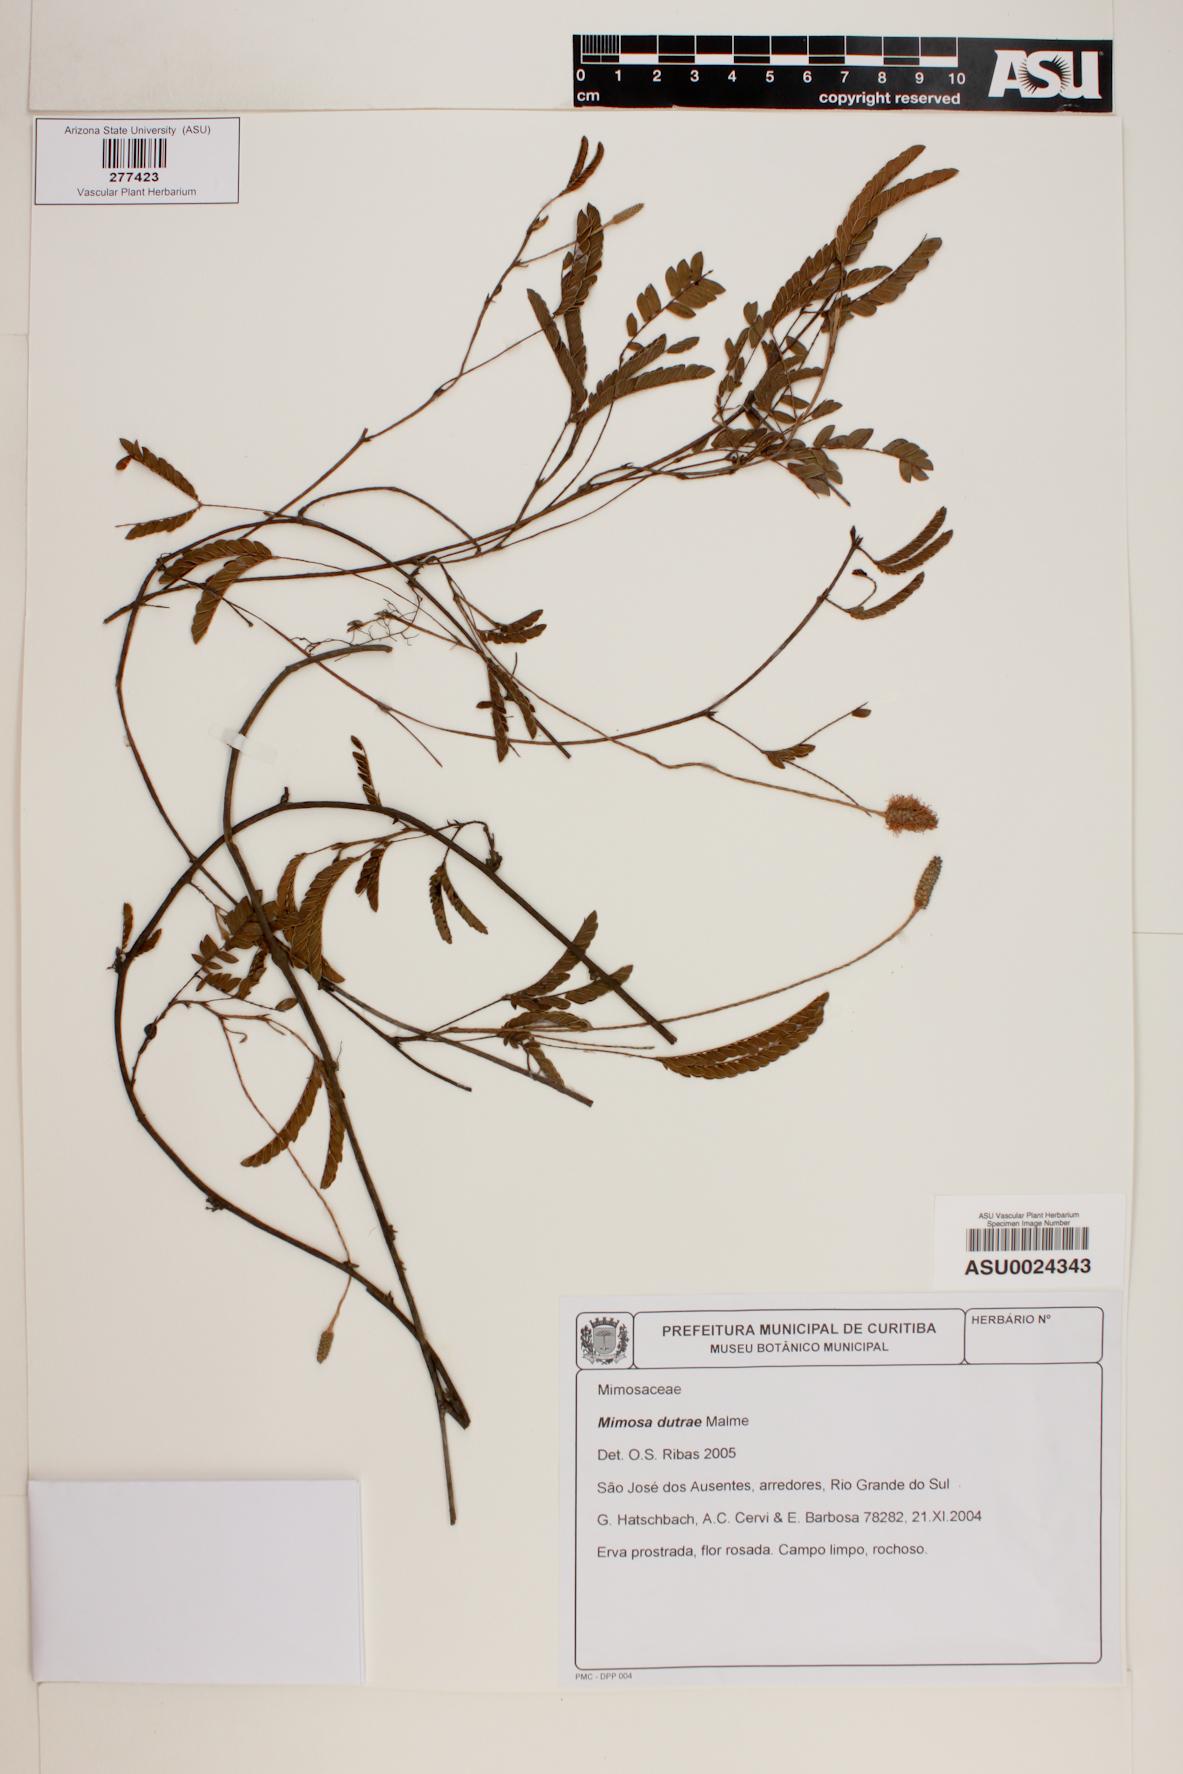 Mimosa dutrae image